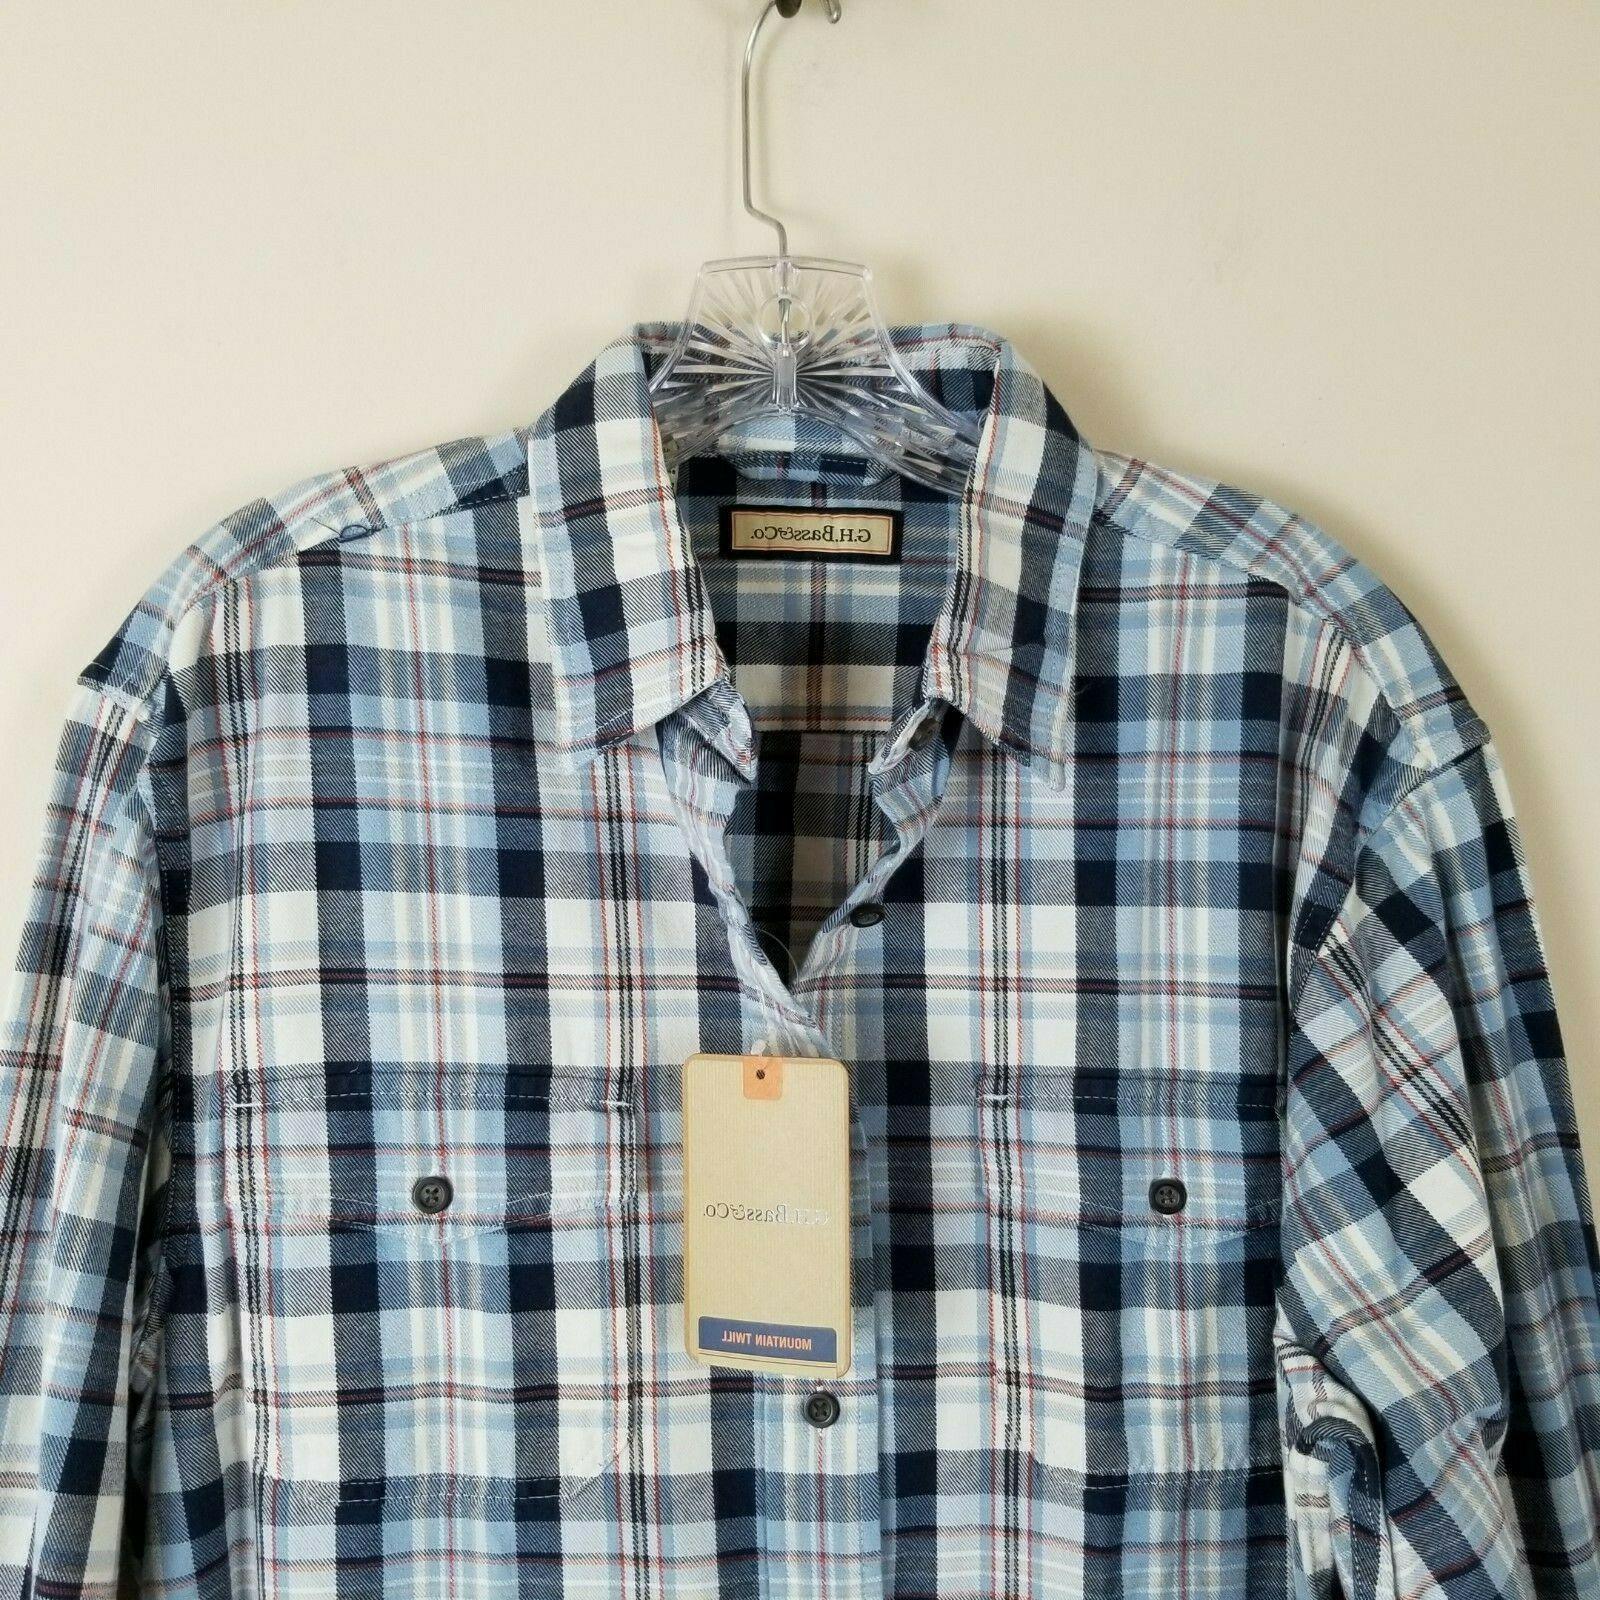 G.H. Bass Mountain Twill Plaid Flannel Shirt Medium M NEW